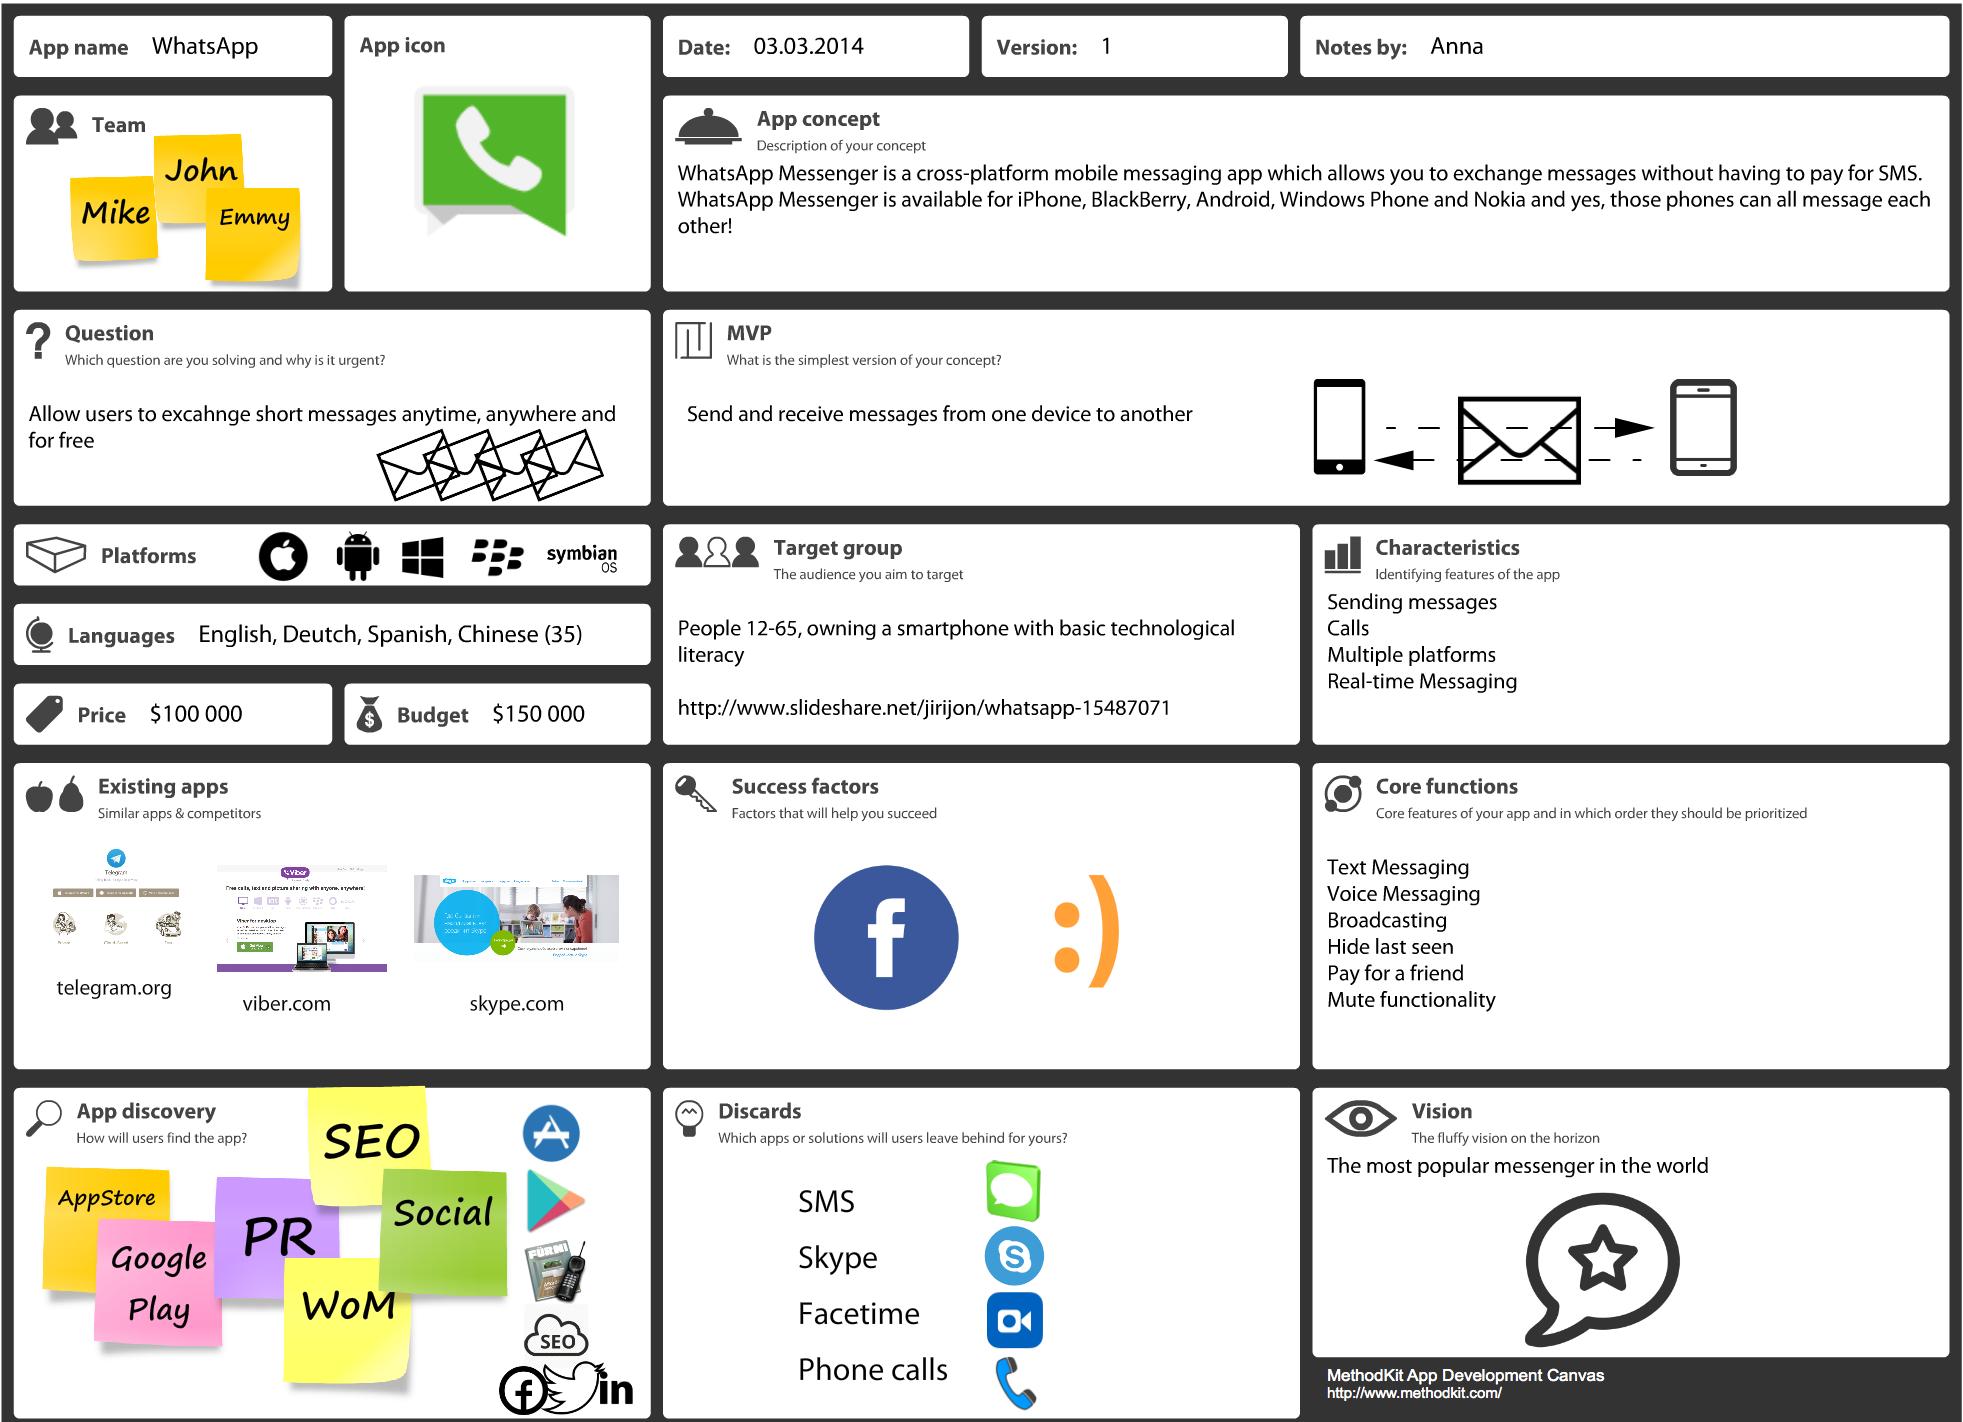 app development canvas example service design ux app development canvas example